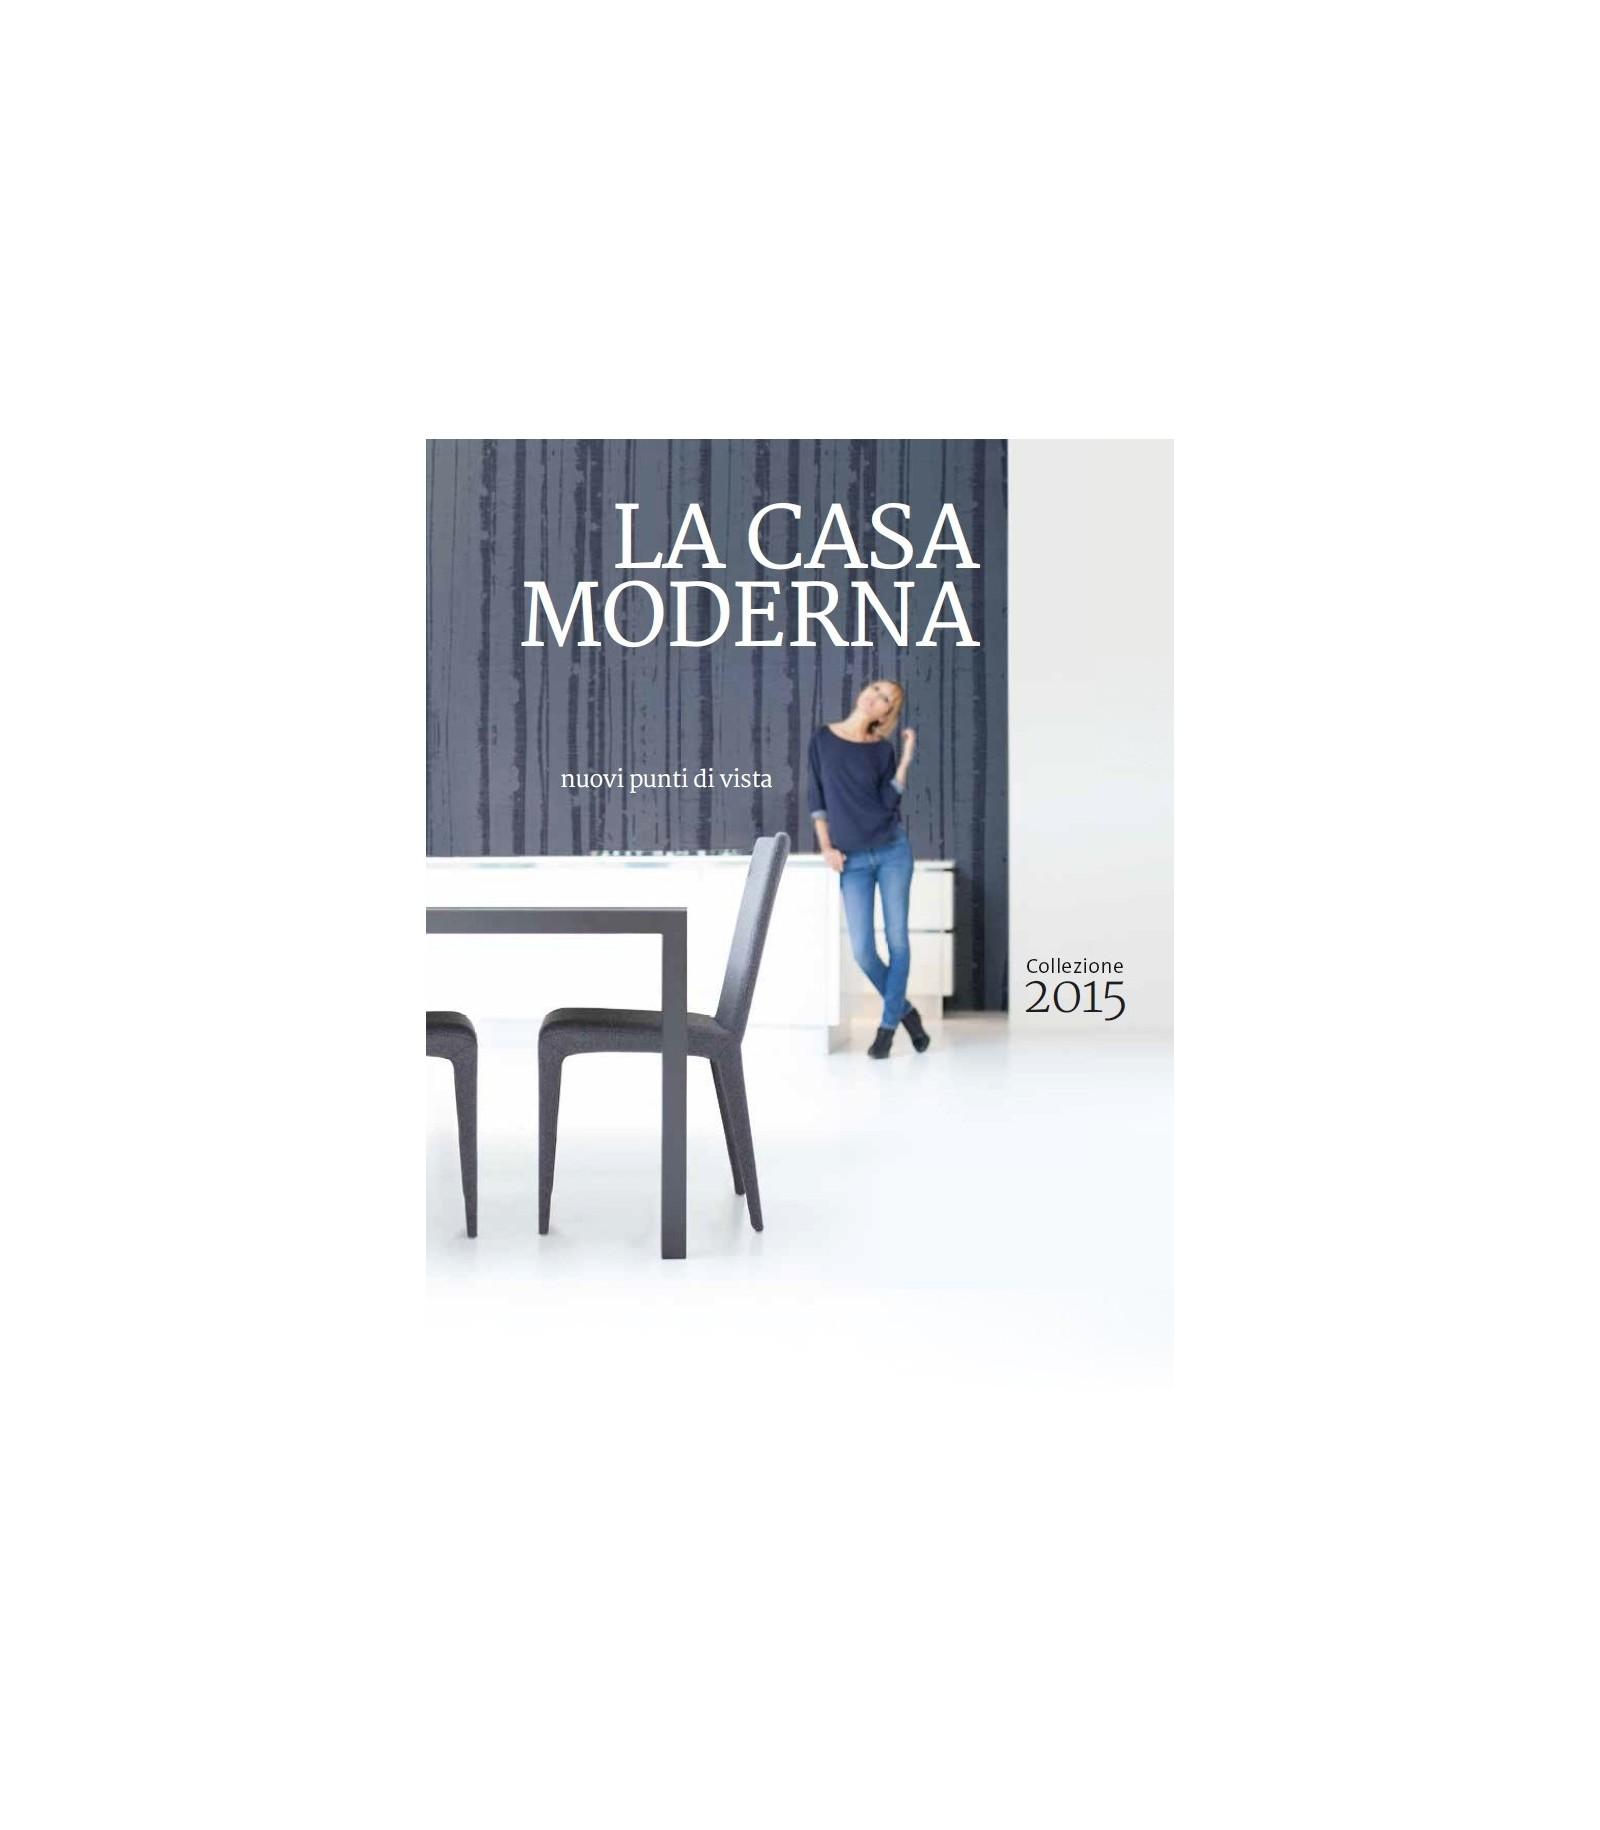 La casa moderna catalogo 2015 for Moderna catalogo